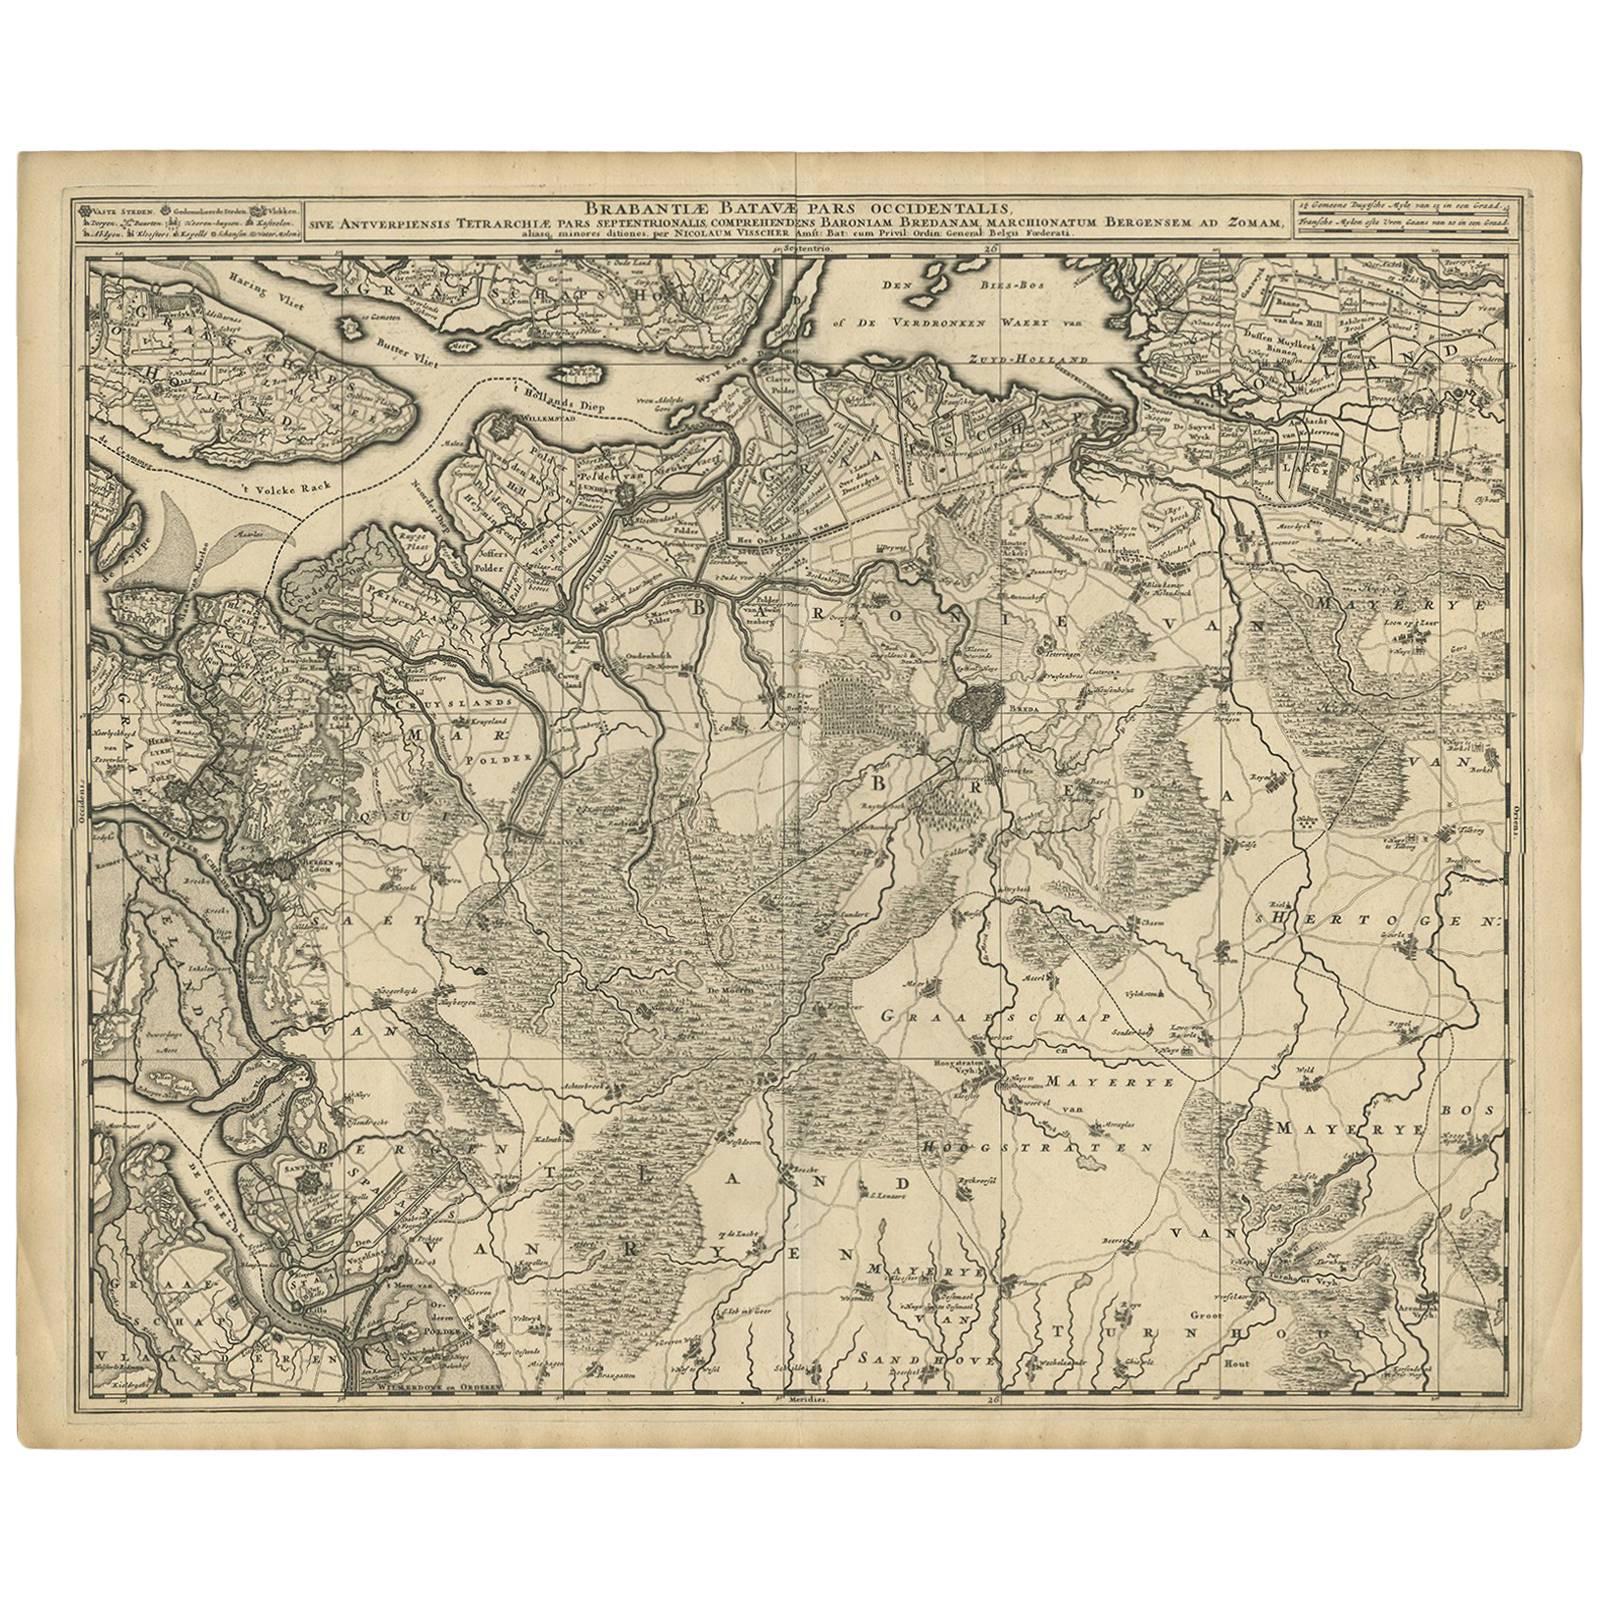 Antique Map of Brabant 'The Netherlands' by N. Visscher, circa 1690